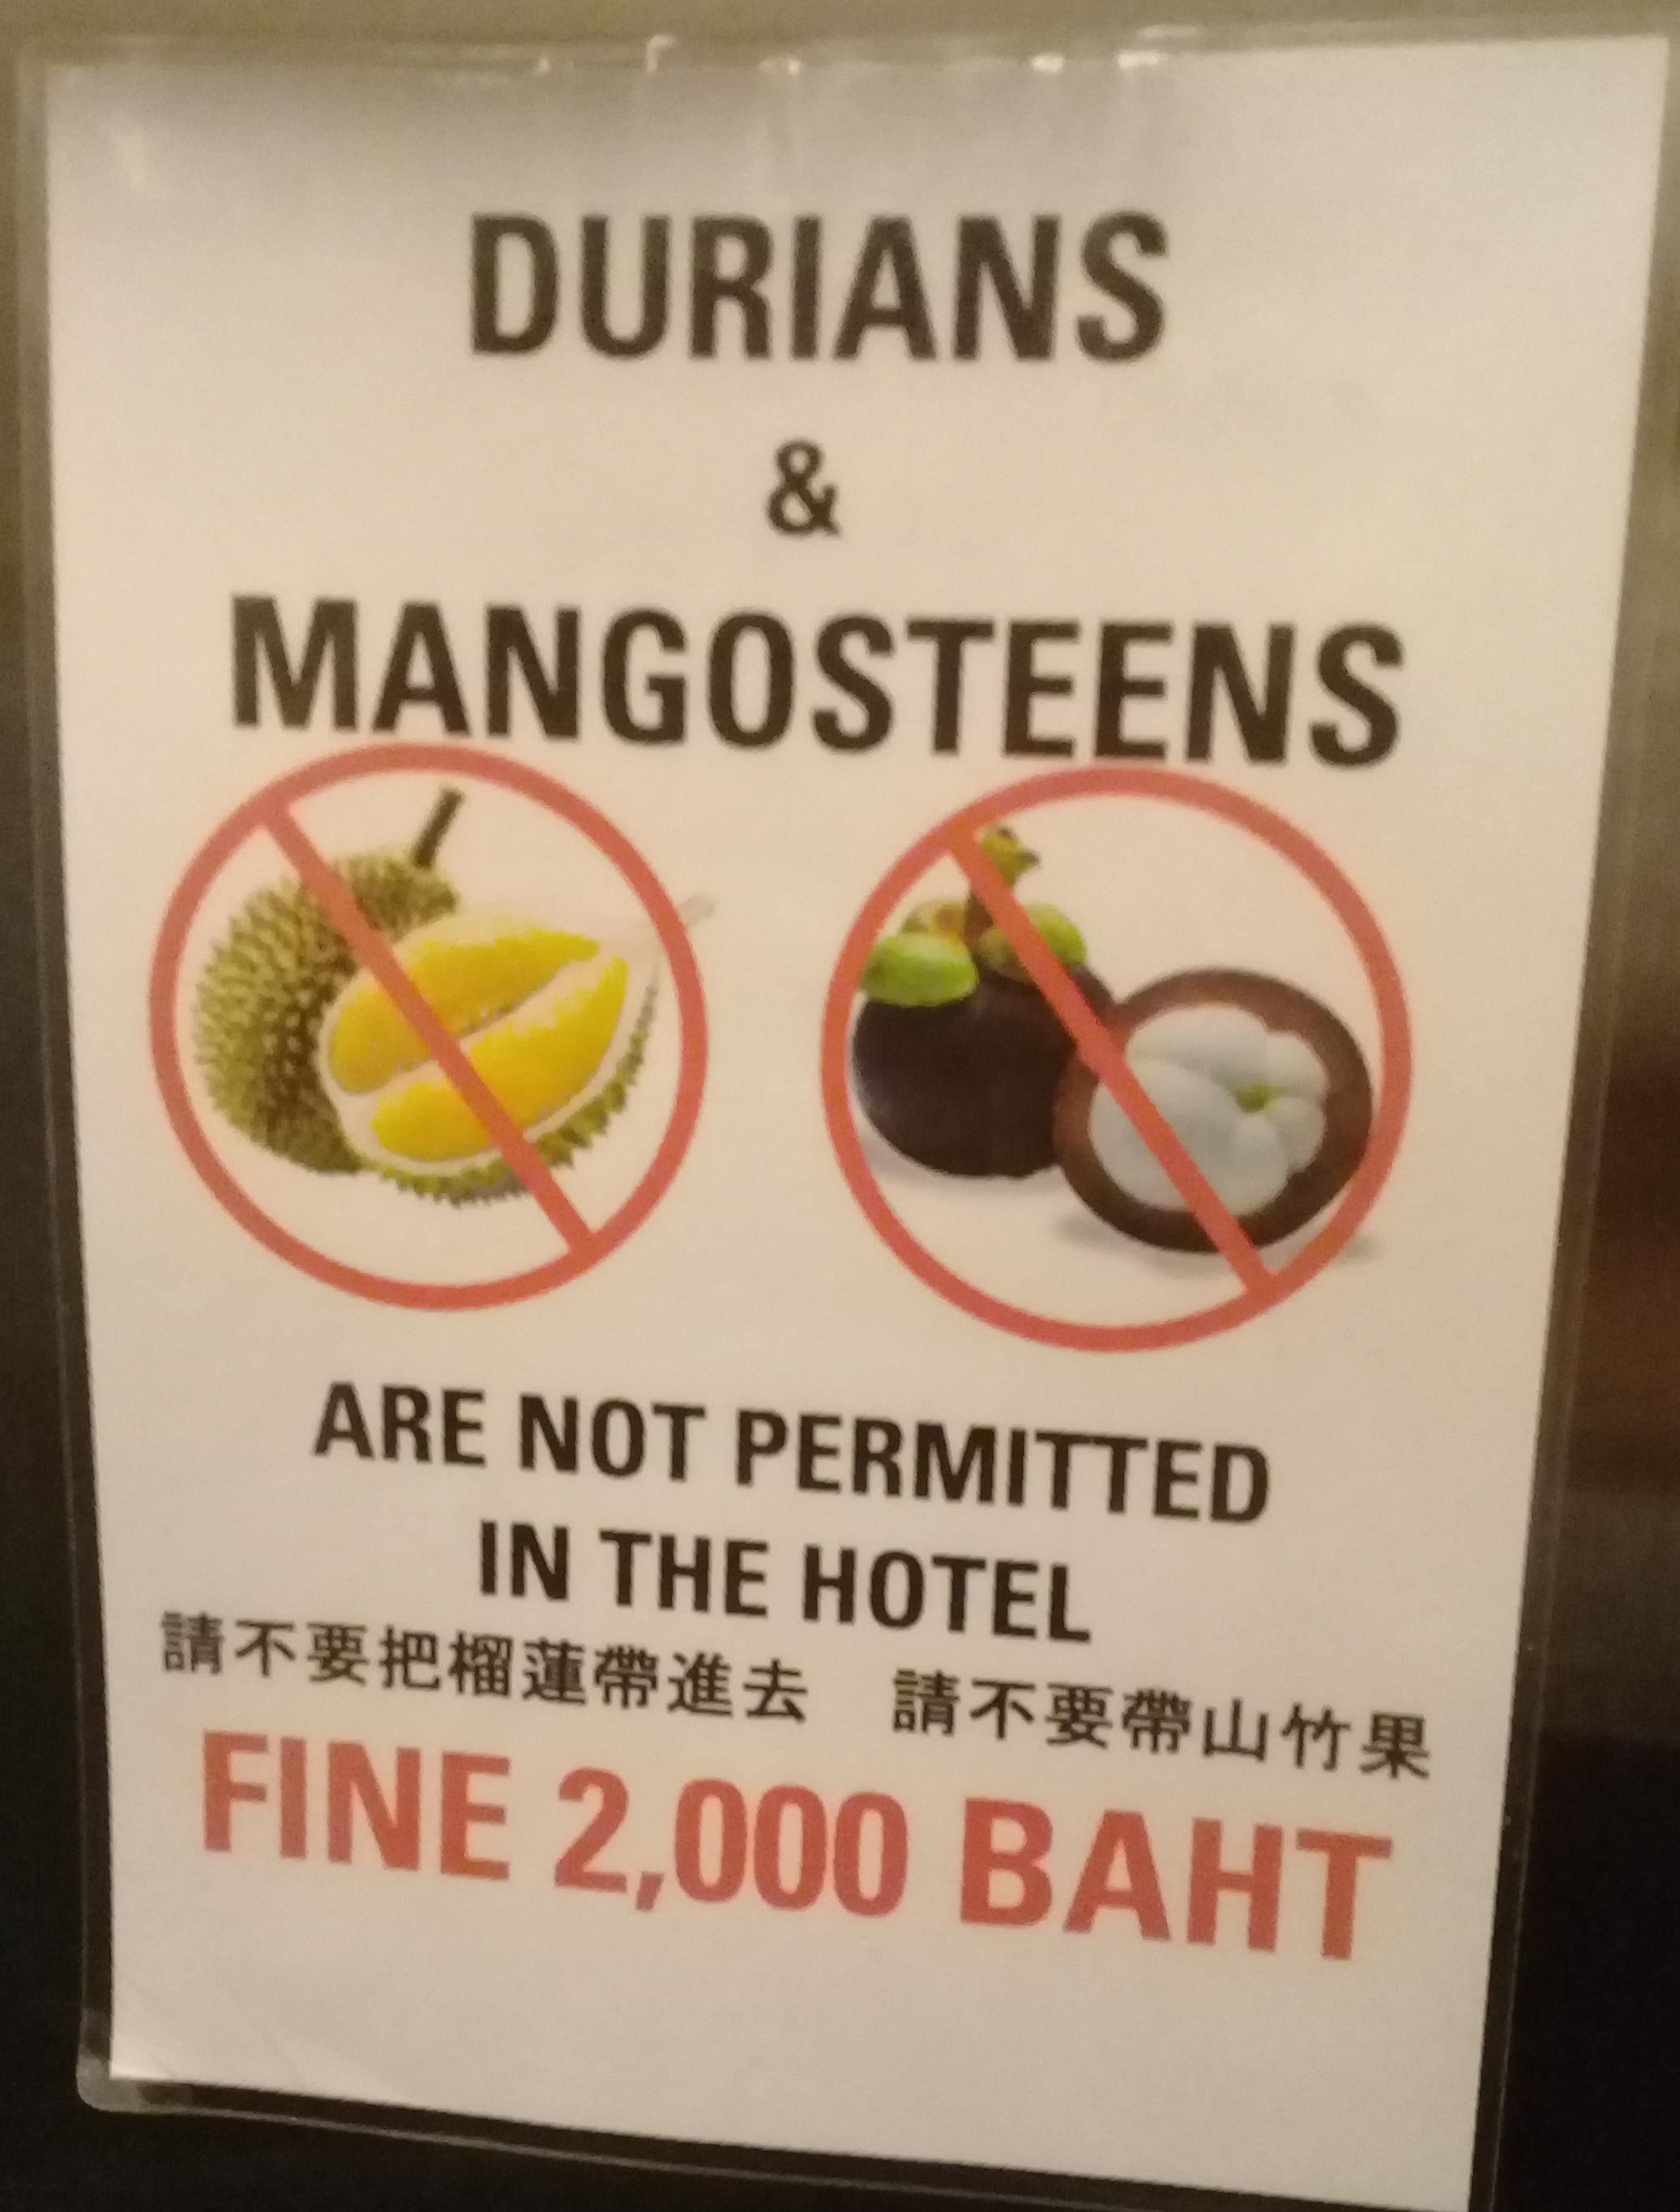 Anti-durian and mangosteen signage seen on a hotel elevator in Karon, Phuket, Thailand. Photo taken by Mark Joseph Jochim on June 6, 2018.